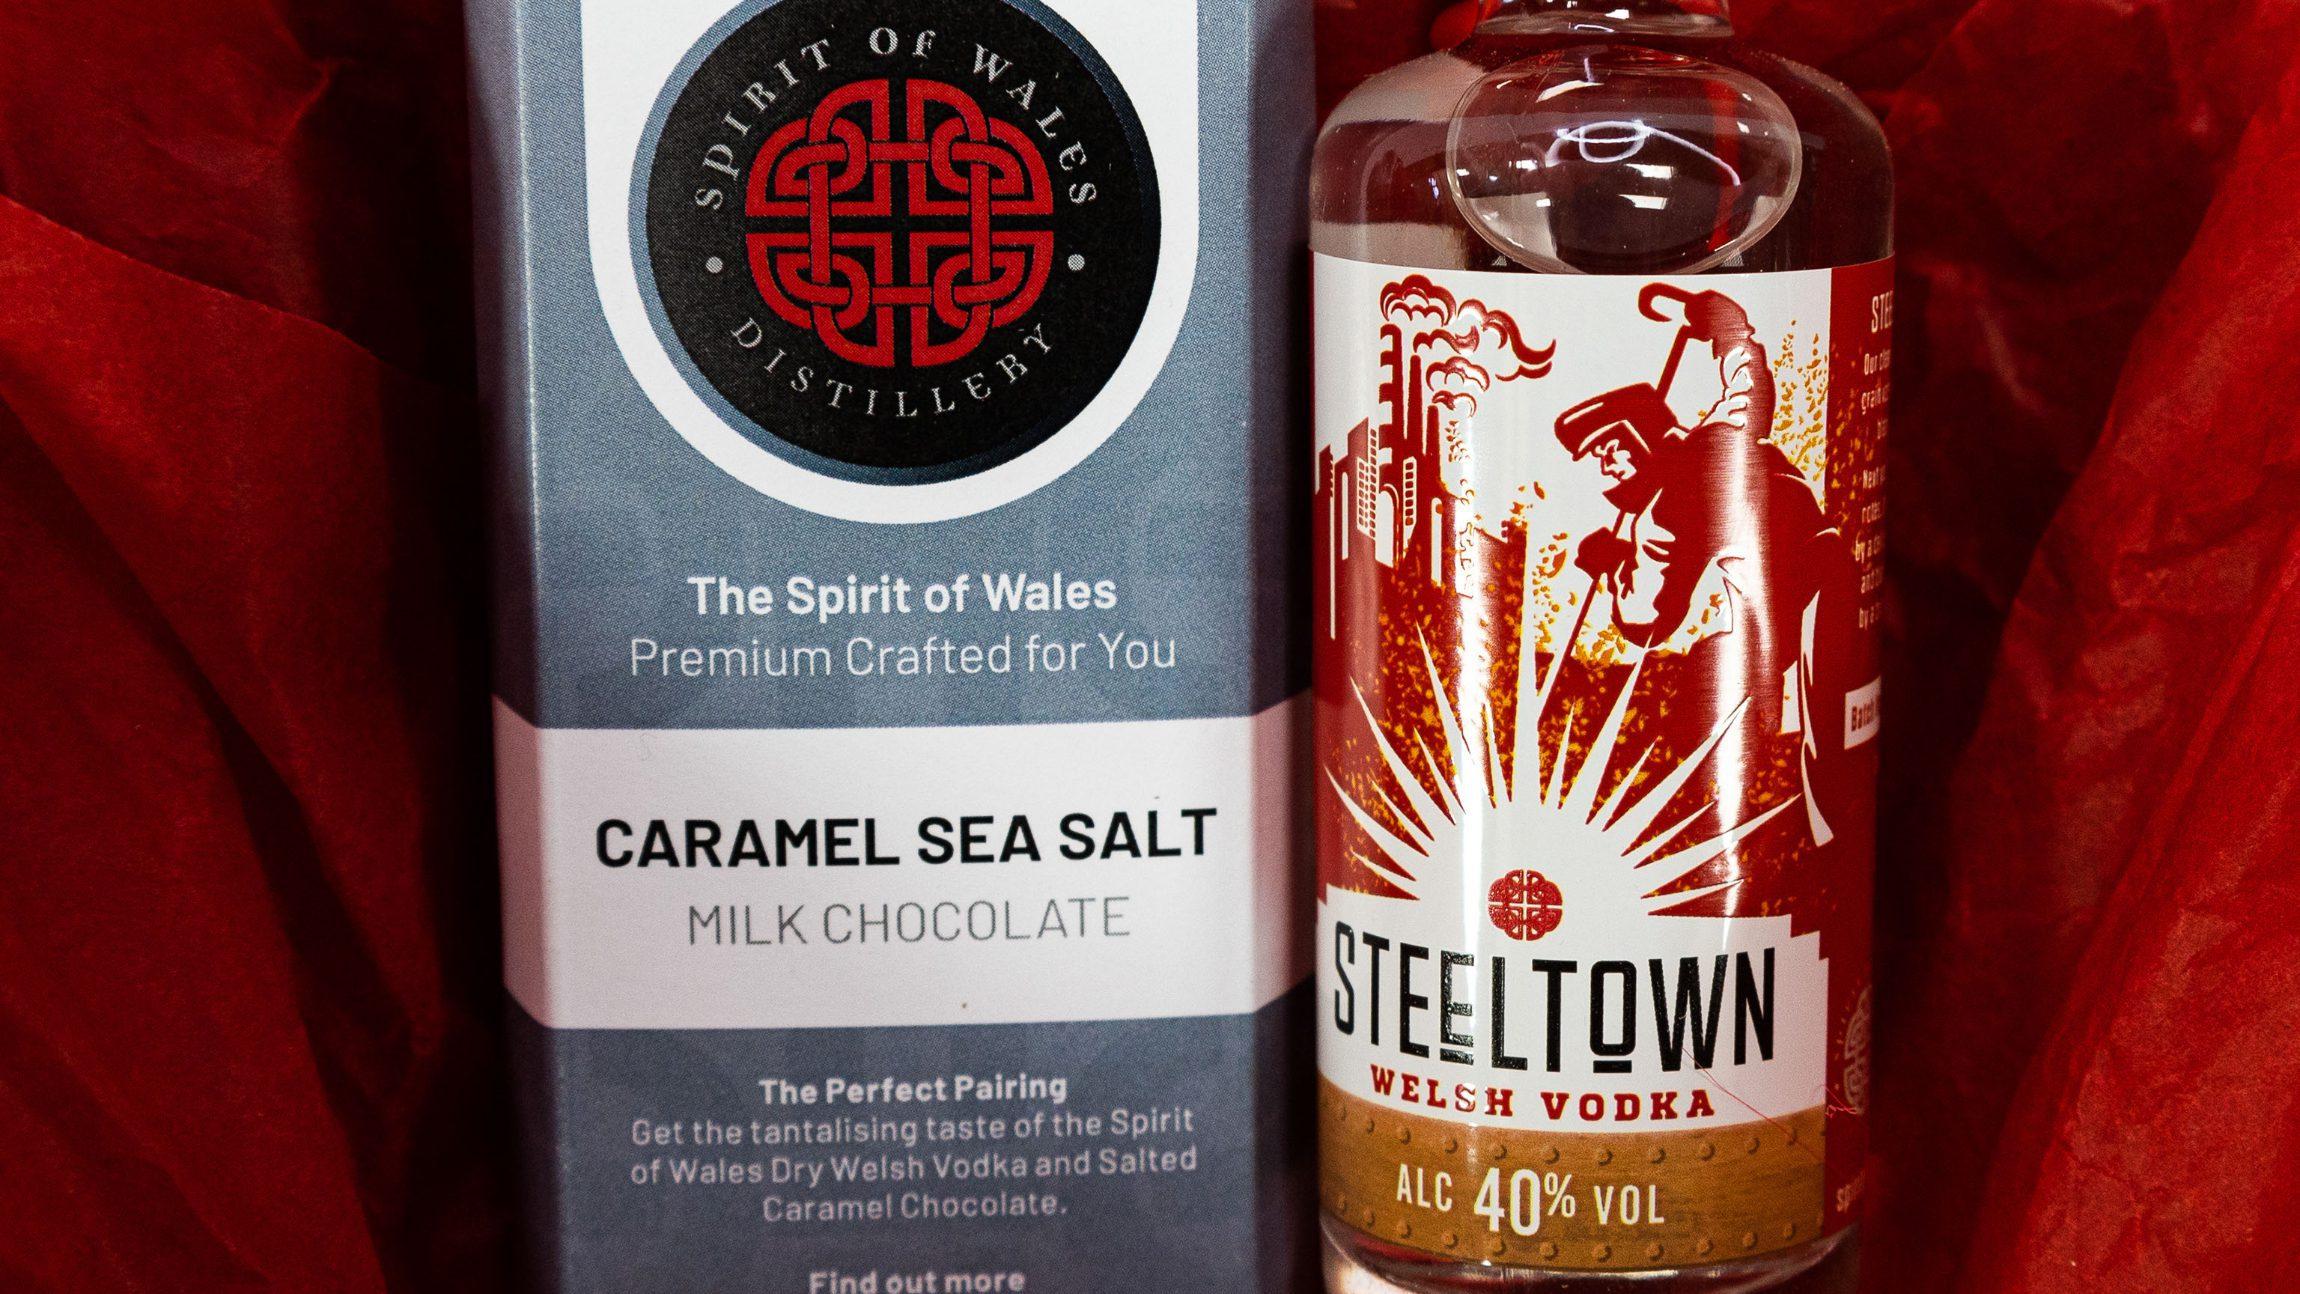 Spirit of Wales Distillery - Chocolate Pairings - Welsh vodka with caramel sea salt chocolate